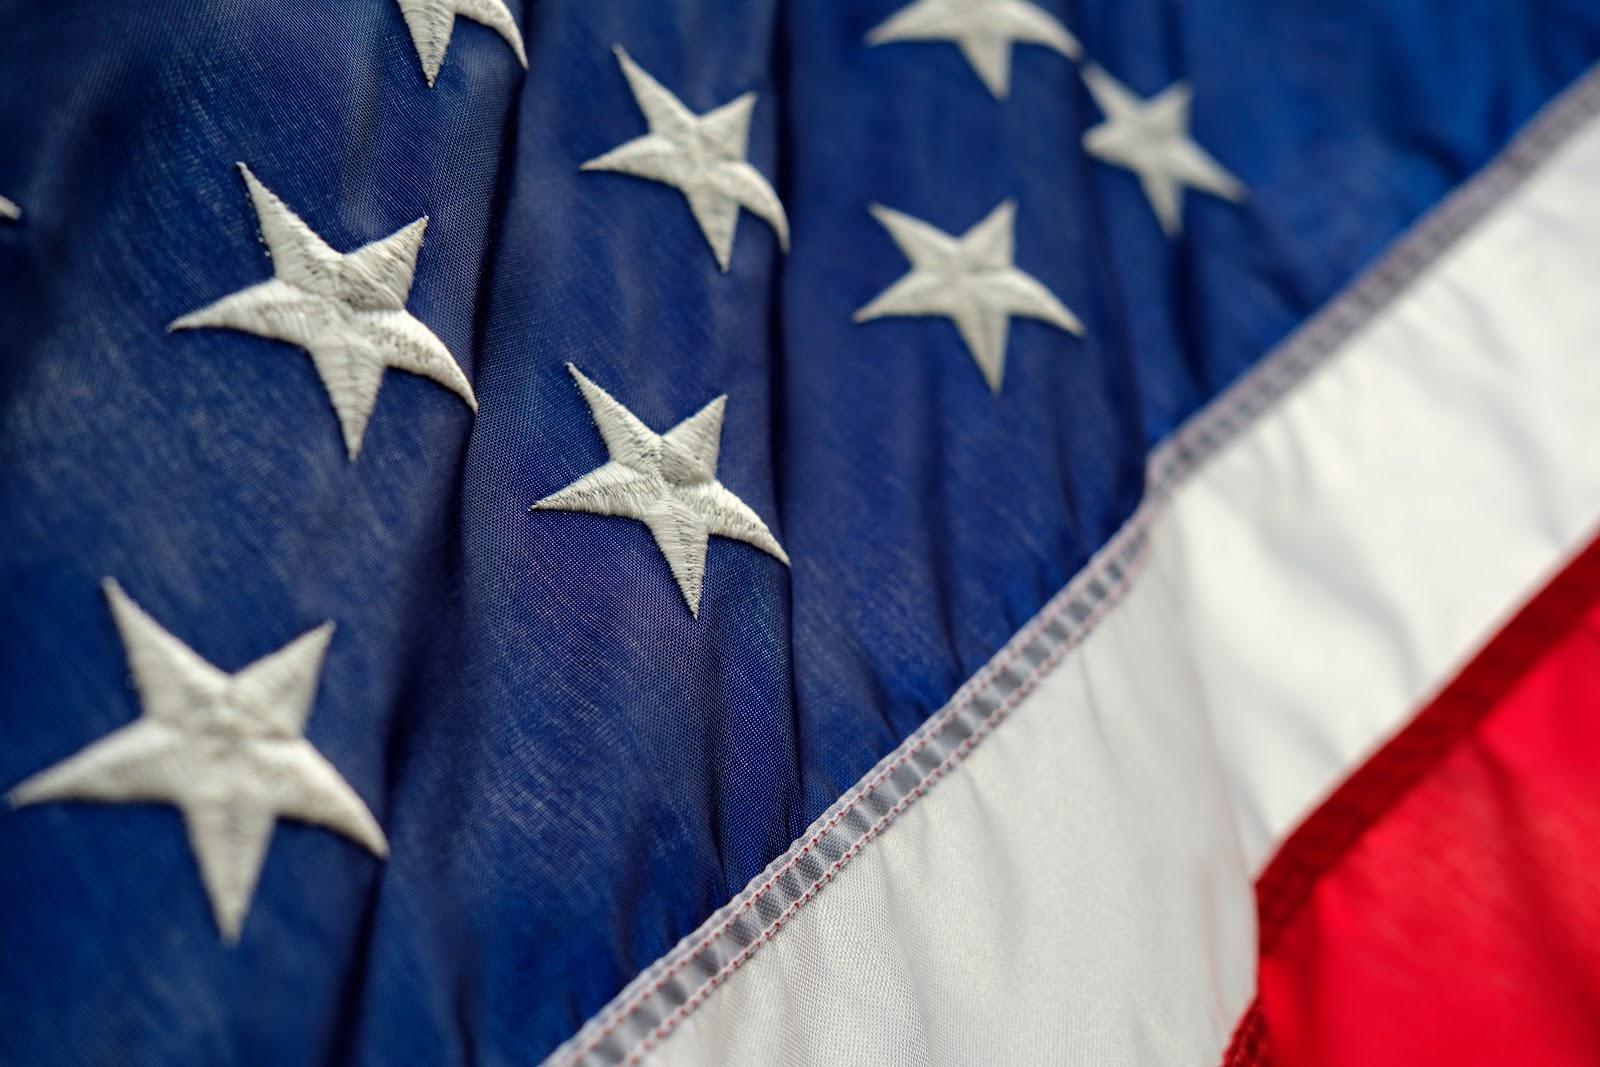 The US flag